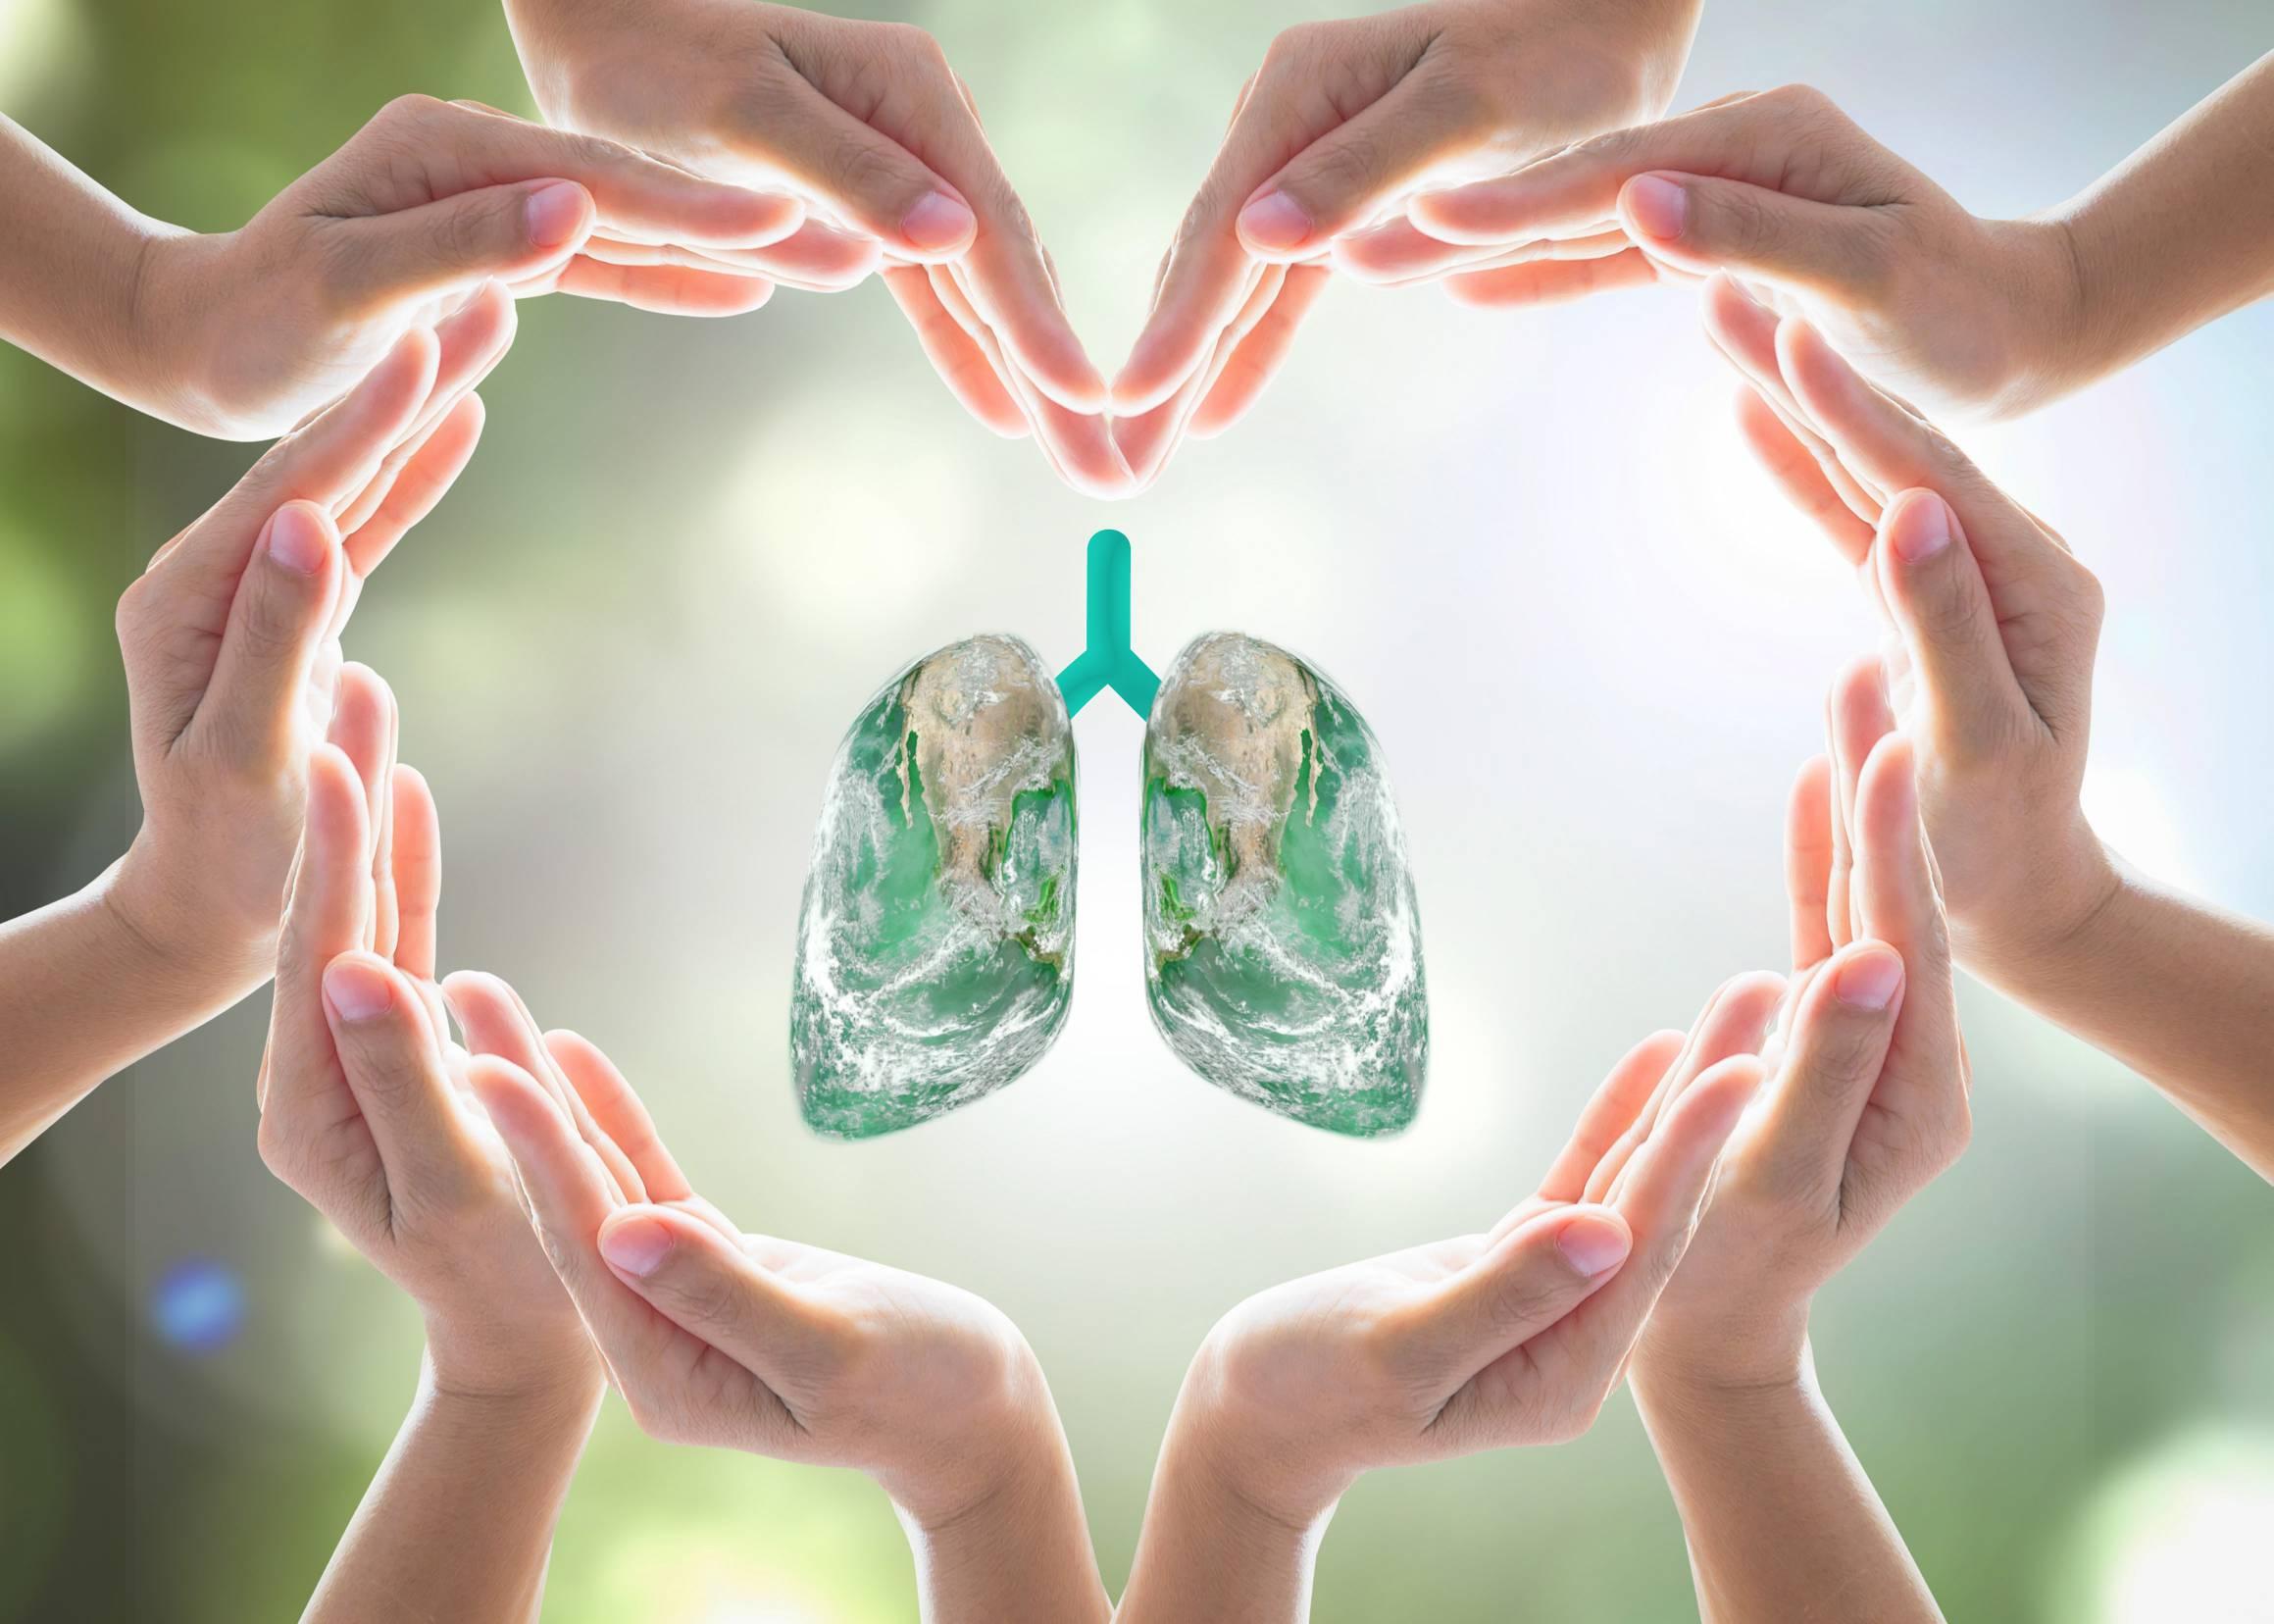 Asthma & Bronchitis